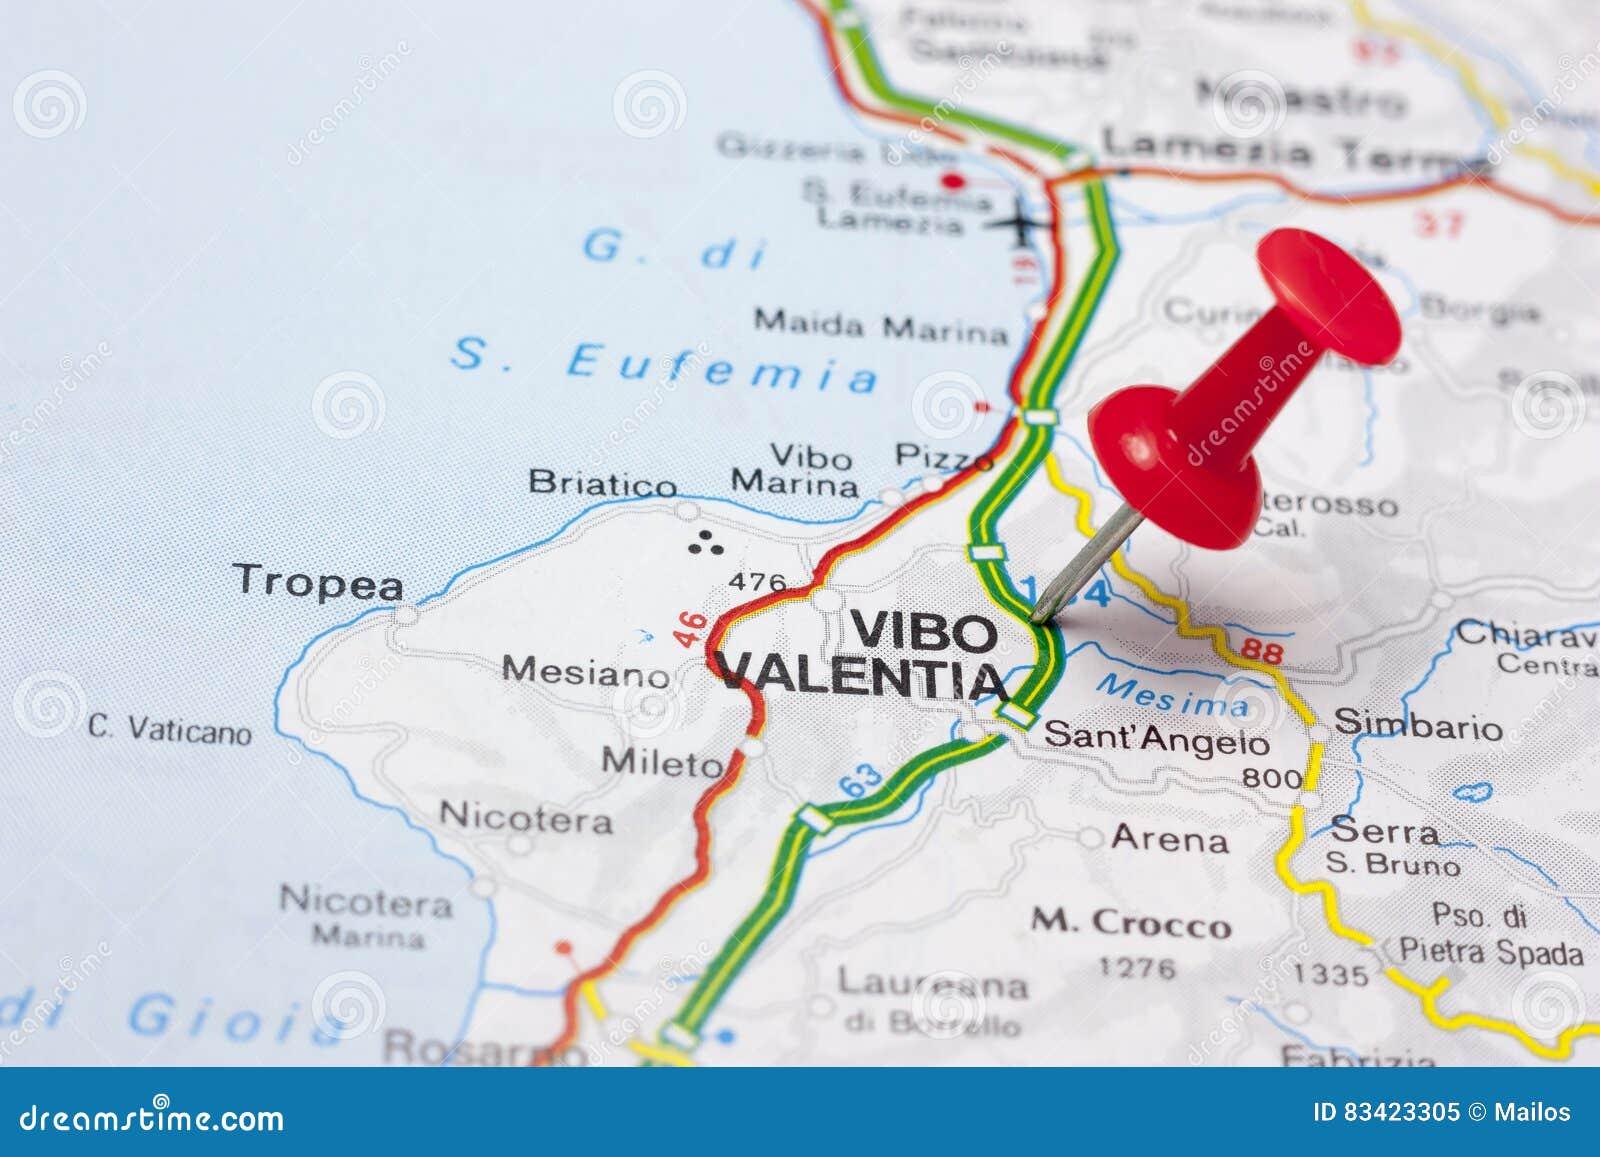 Vibo Valentia Italy On A Map Stock Illustration Illustration Of